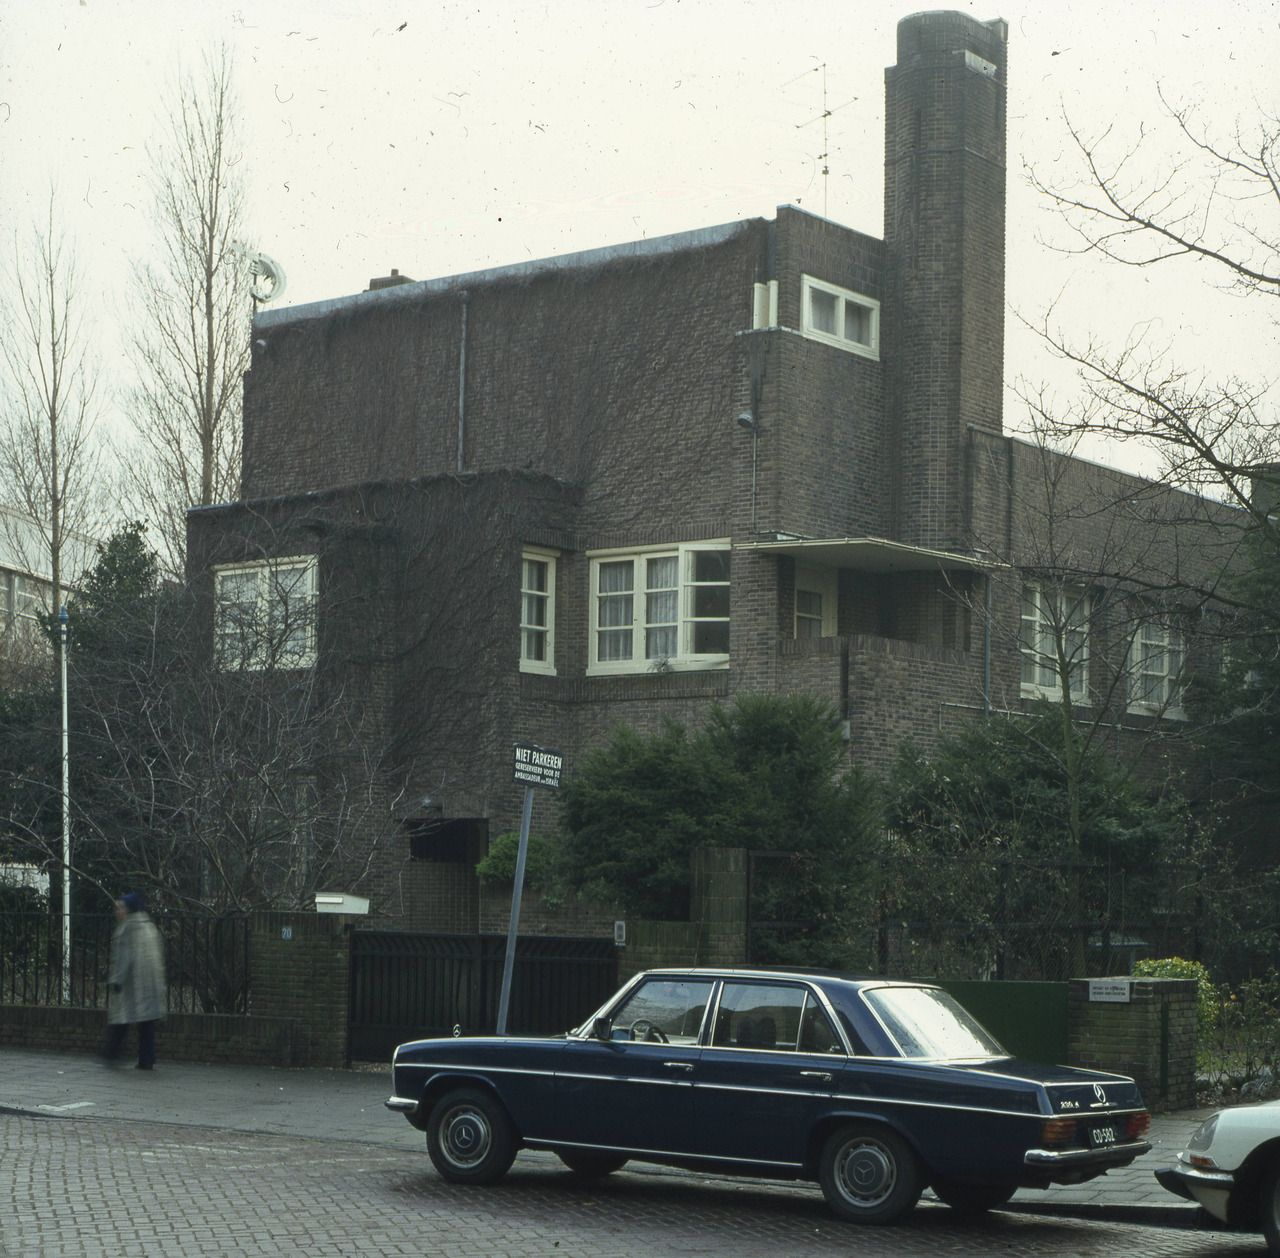 Villa Sevenstijn (192122) in The Hague, the Netherlands